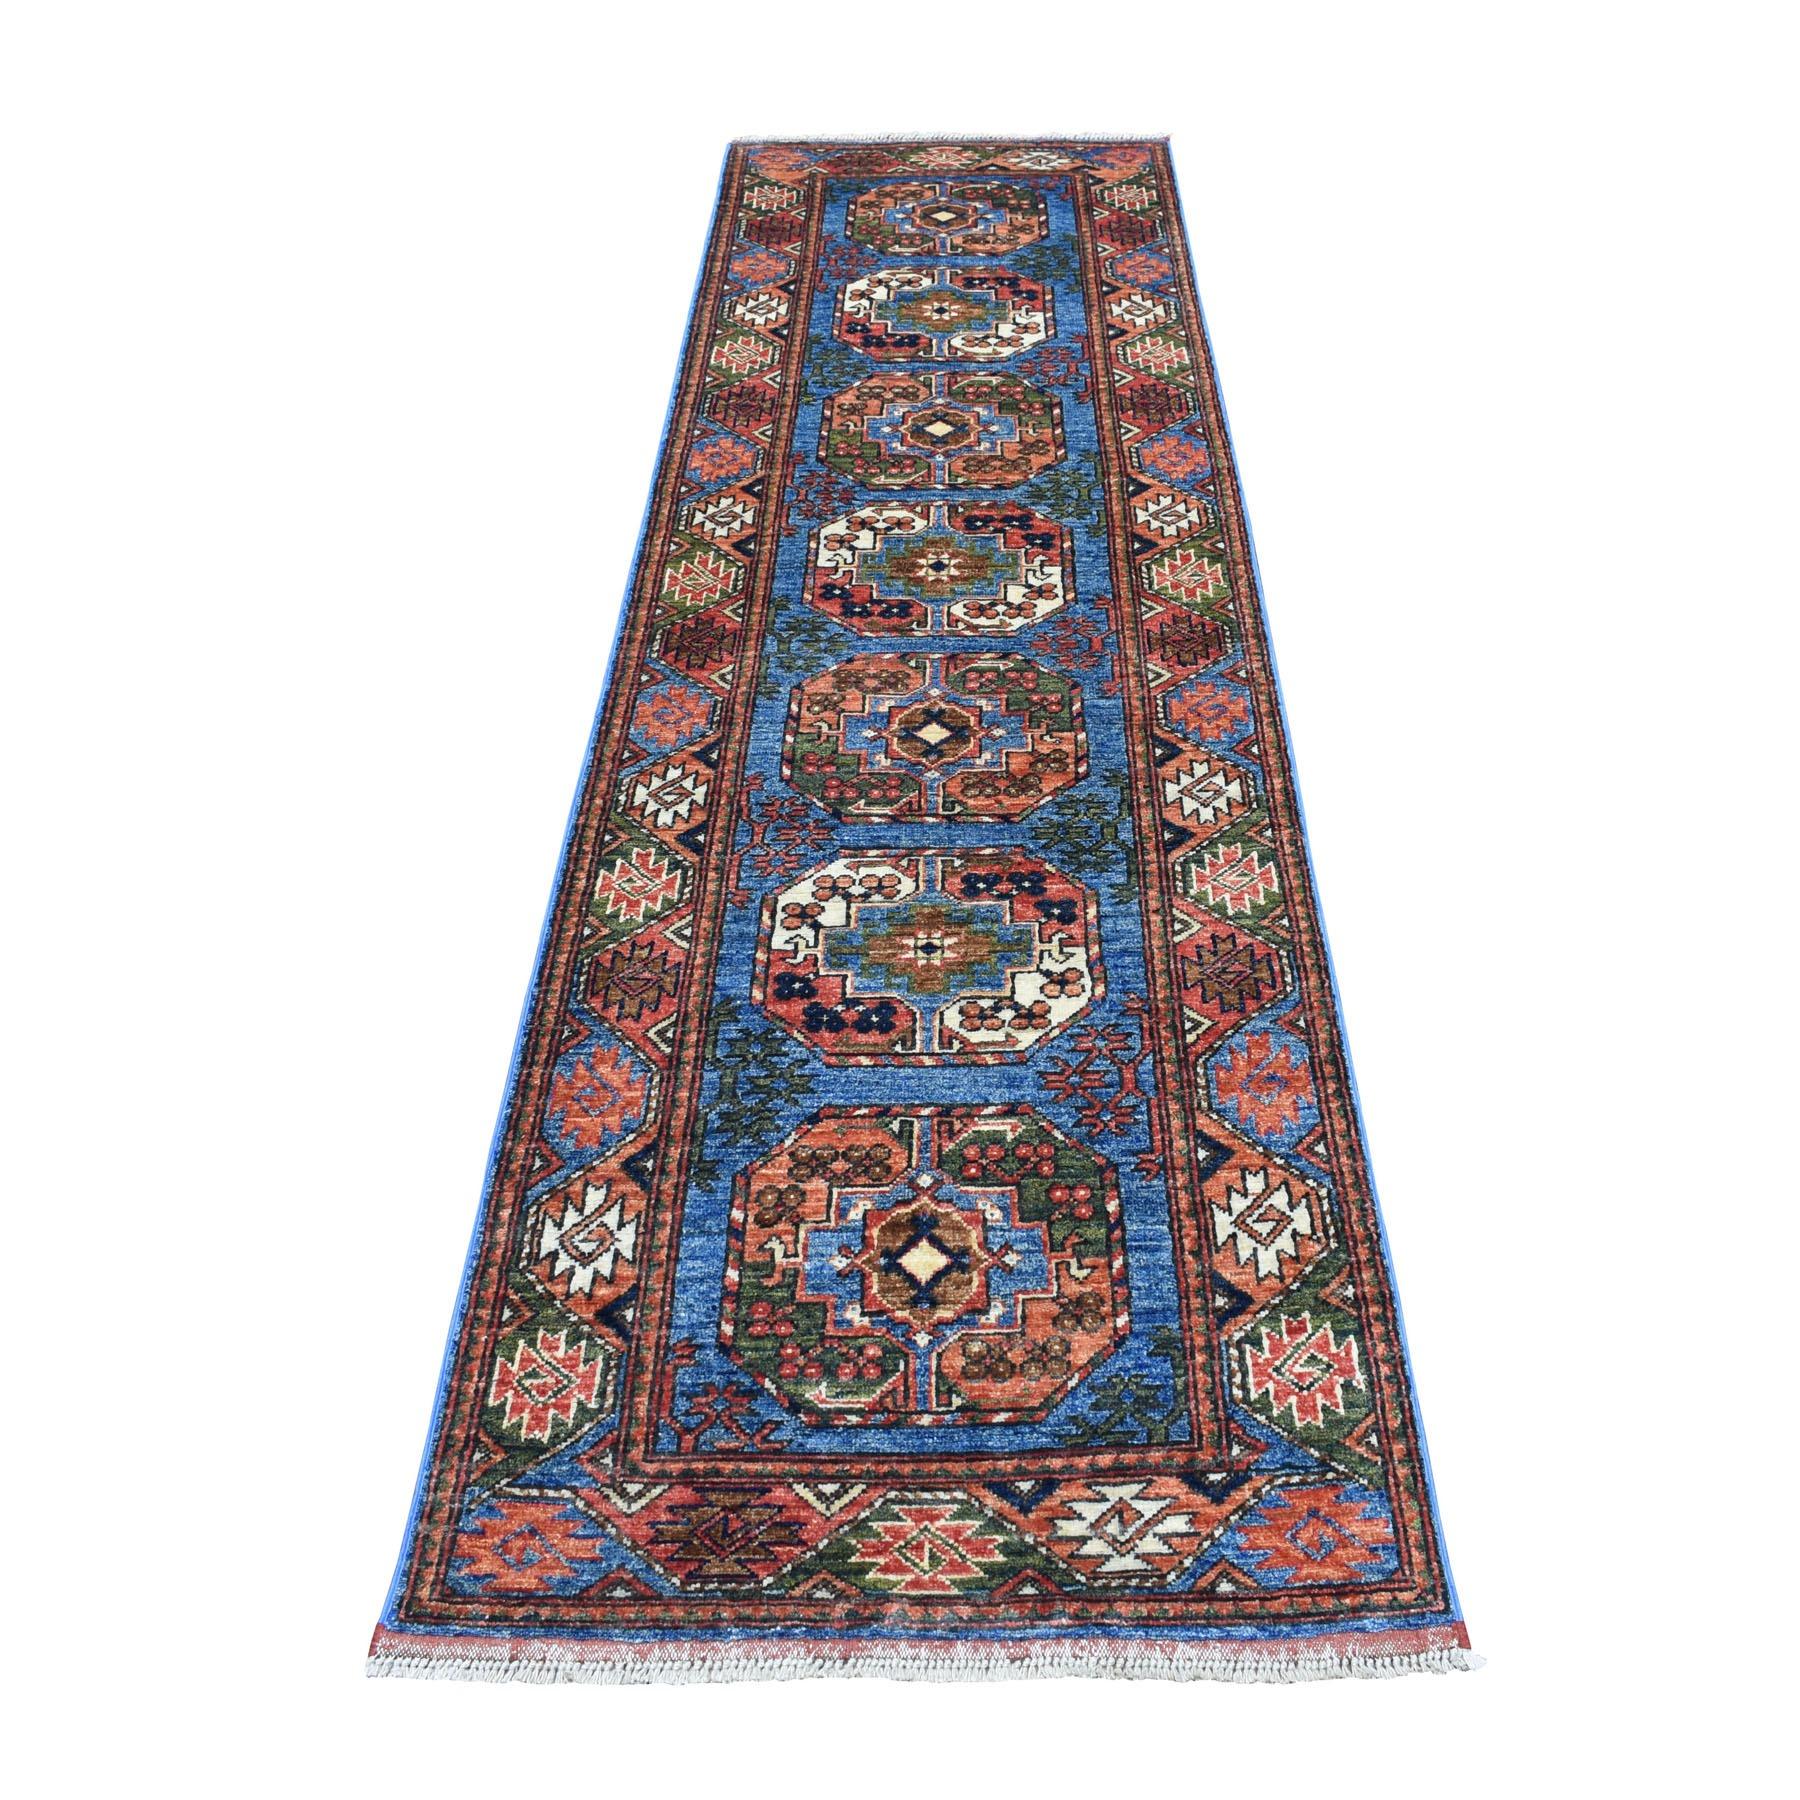 "2'8""X9'2"" Blue Afghan Ersari Elephant Feet Design Pure Wool Hand Knotted Oriental Rug  moaec009"